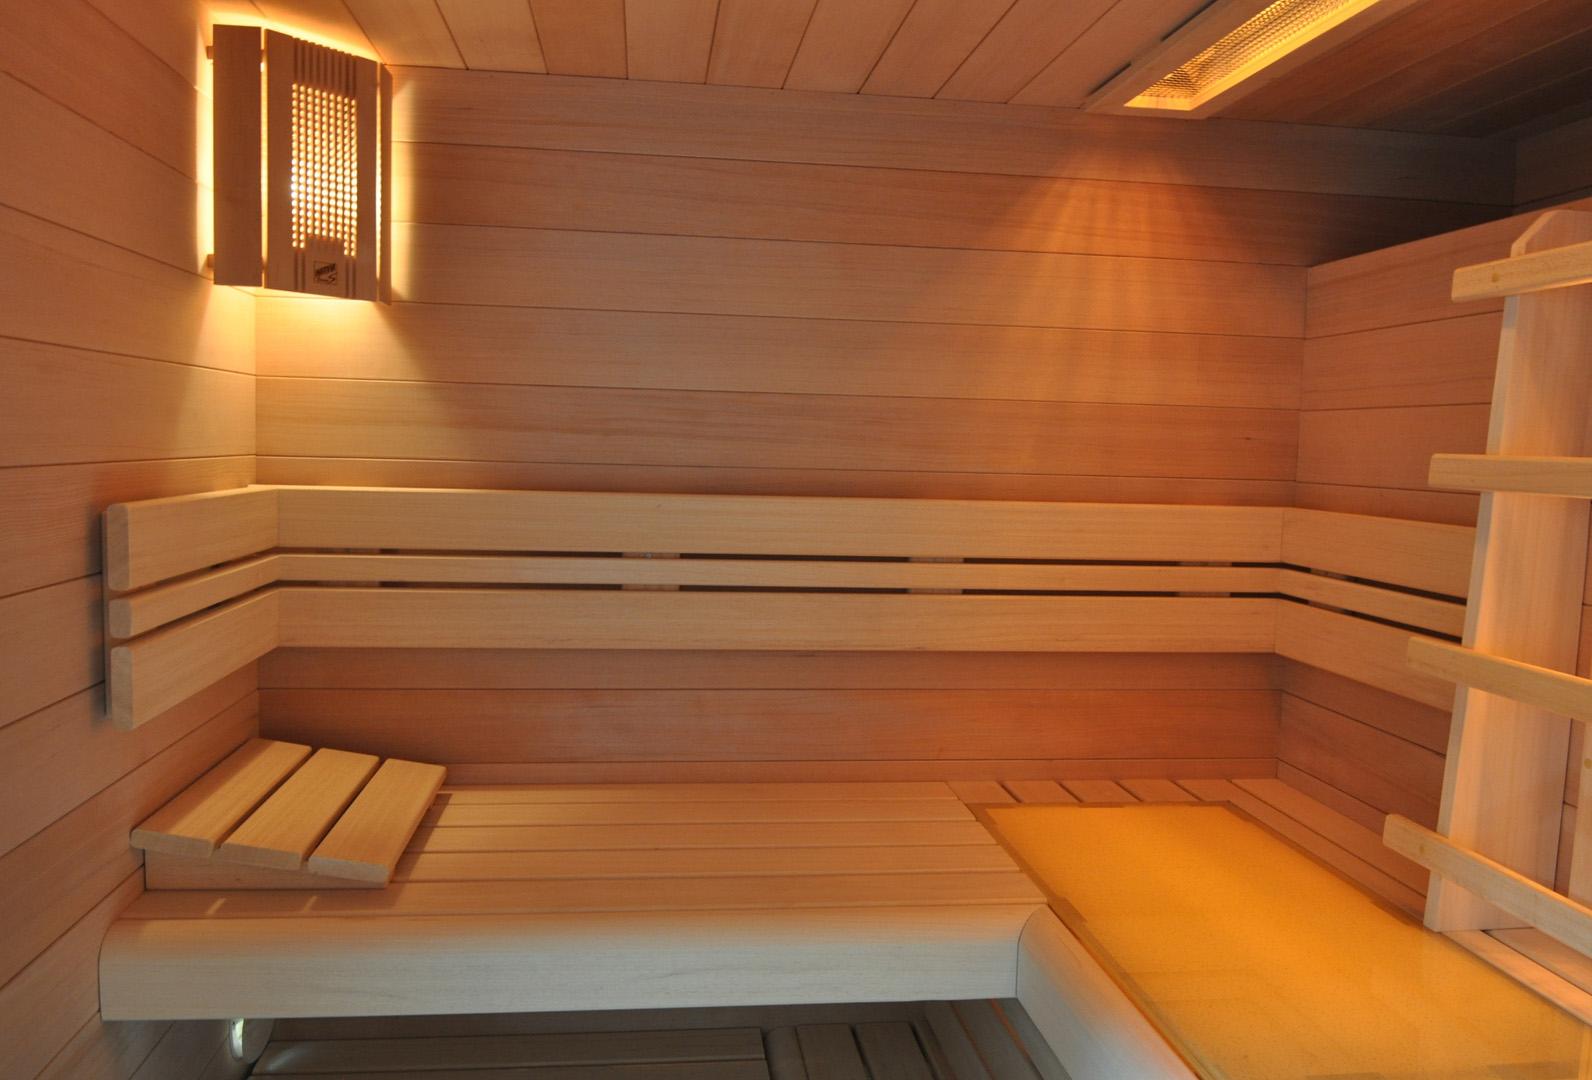 Como hacer una sauna great madera para sauna madera - Construir una sauna ...